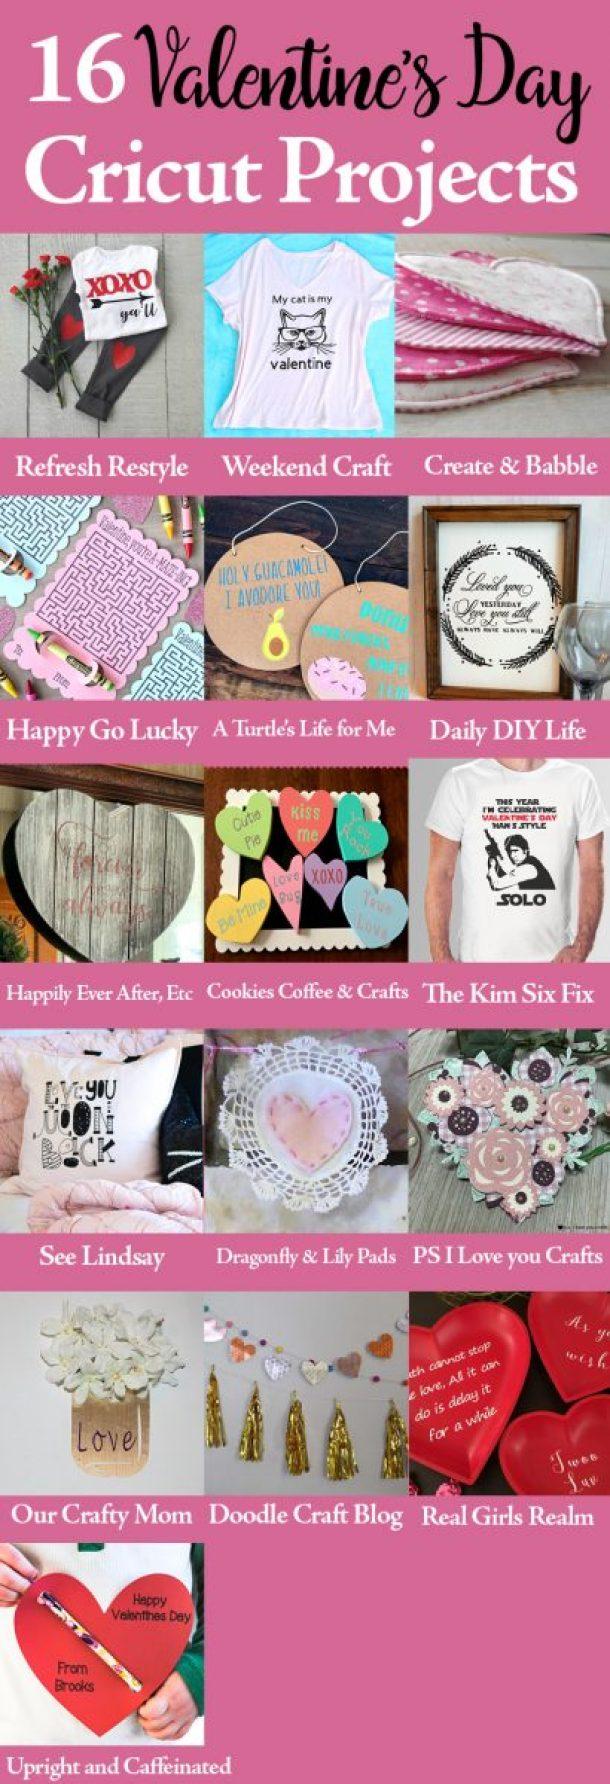 16 Valentine's Day Cricut Projects. #cricut #cricutprojects #valentine #valentinesday